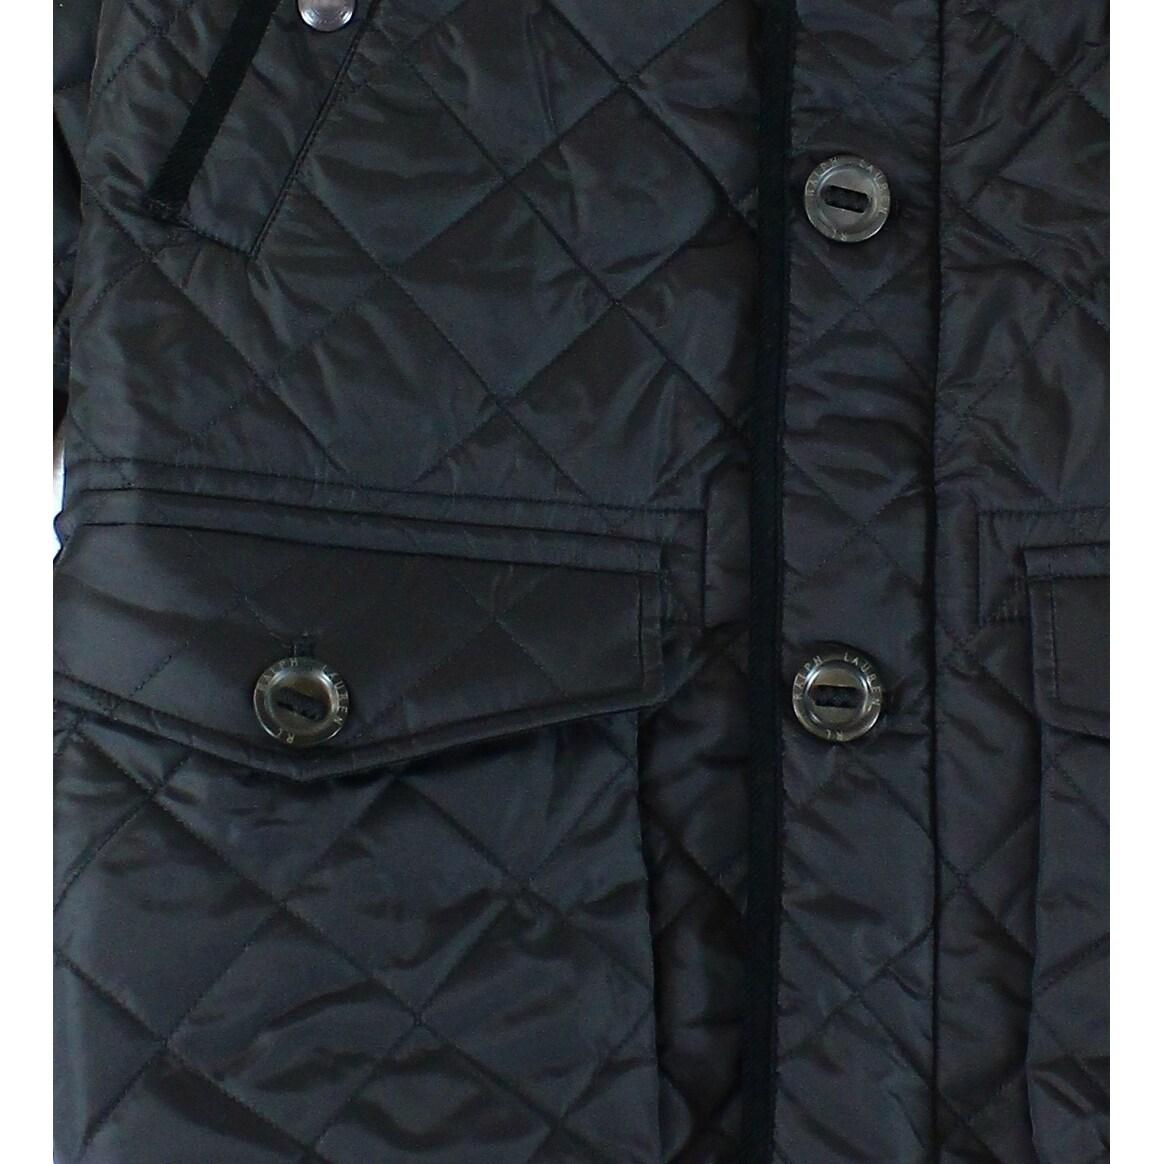 Shop Polo Ralph Lauren New Black Mens Size Large L Diamond Quilted